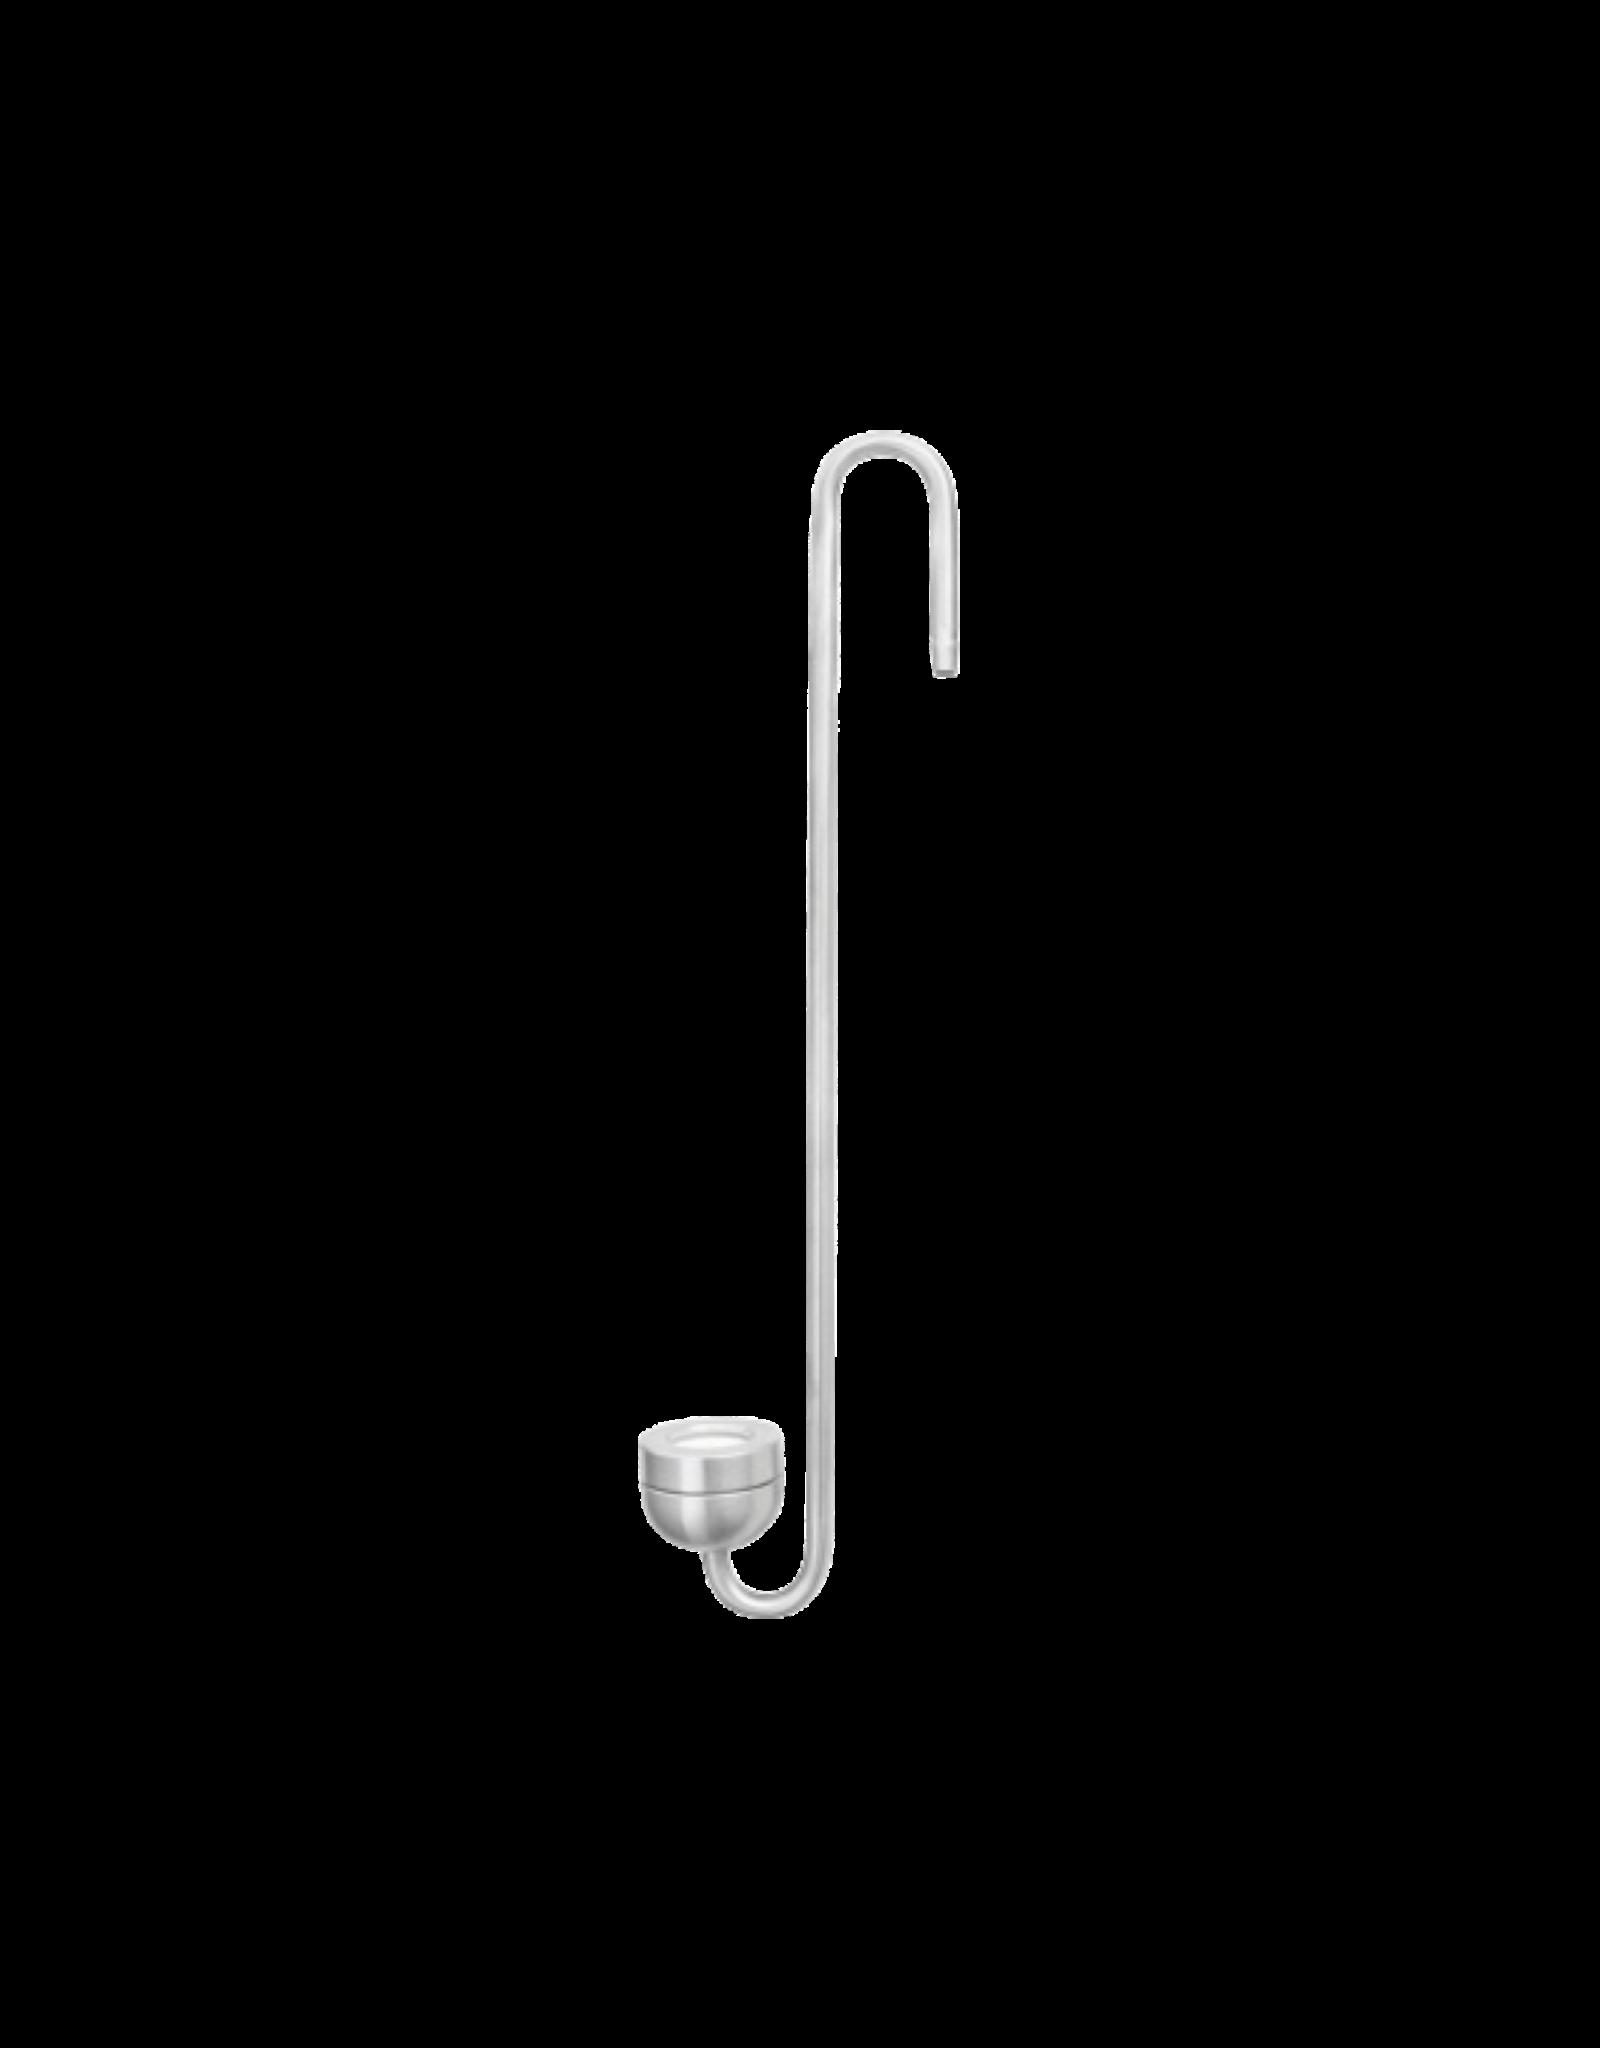 Aqua Nova 30mm stainless steel CO2 diffuser